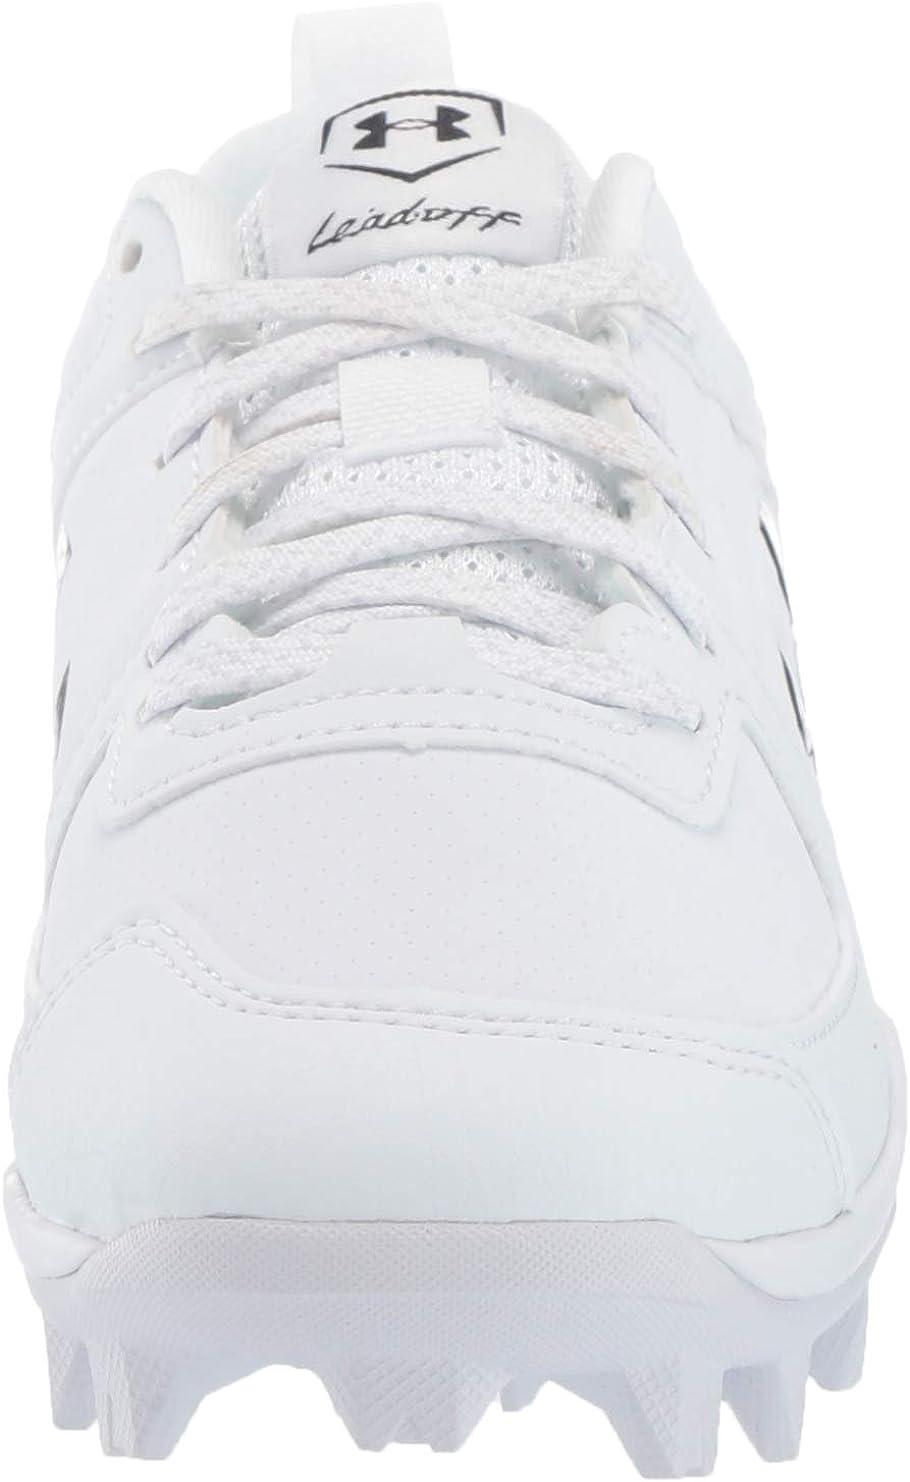 //White Royal 400 1 Little Kid 4-8 Years Baseball Shoe Under Armour Boys Leadoff Low RM Jr